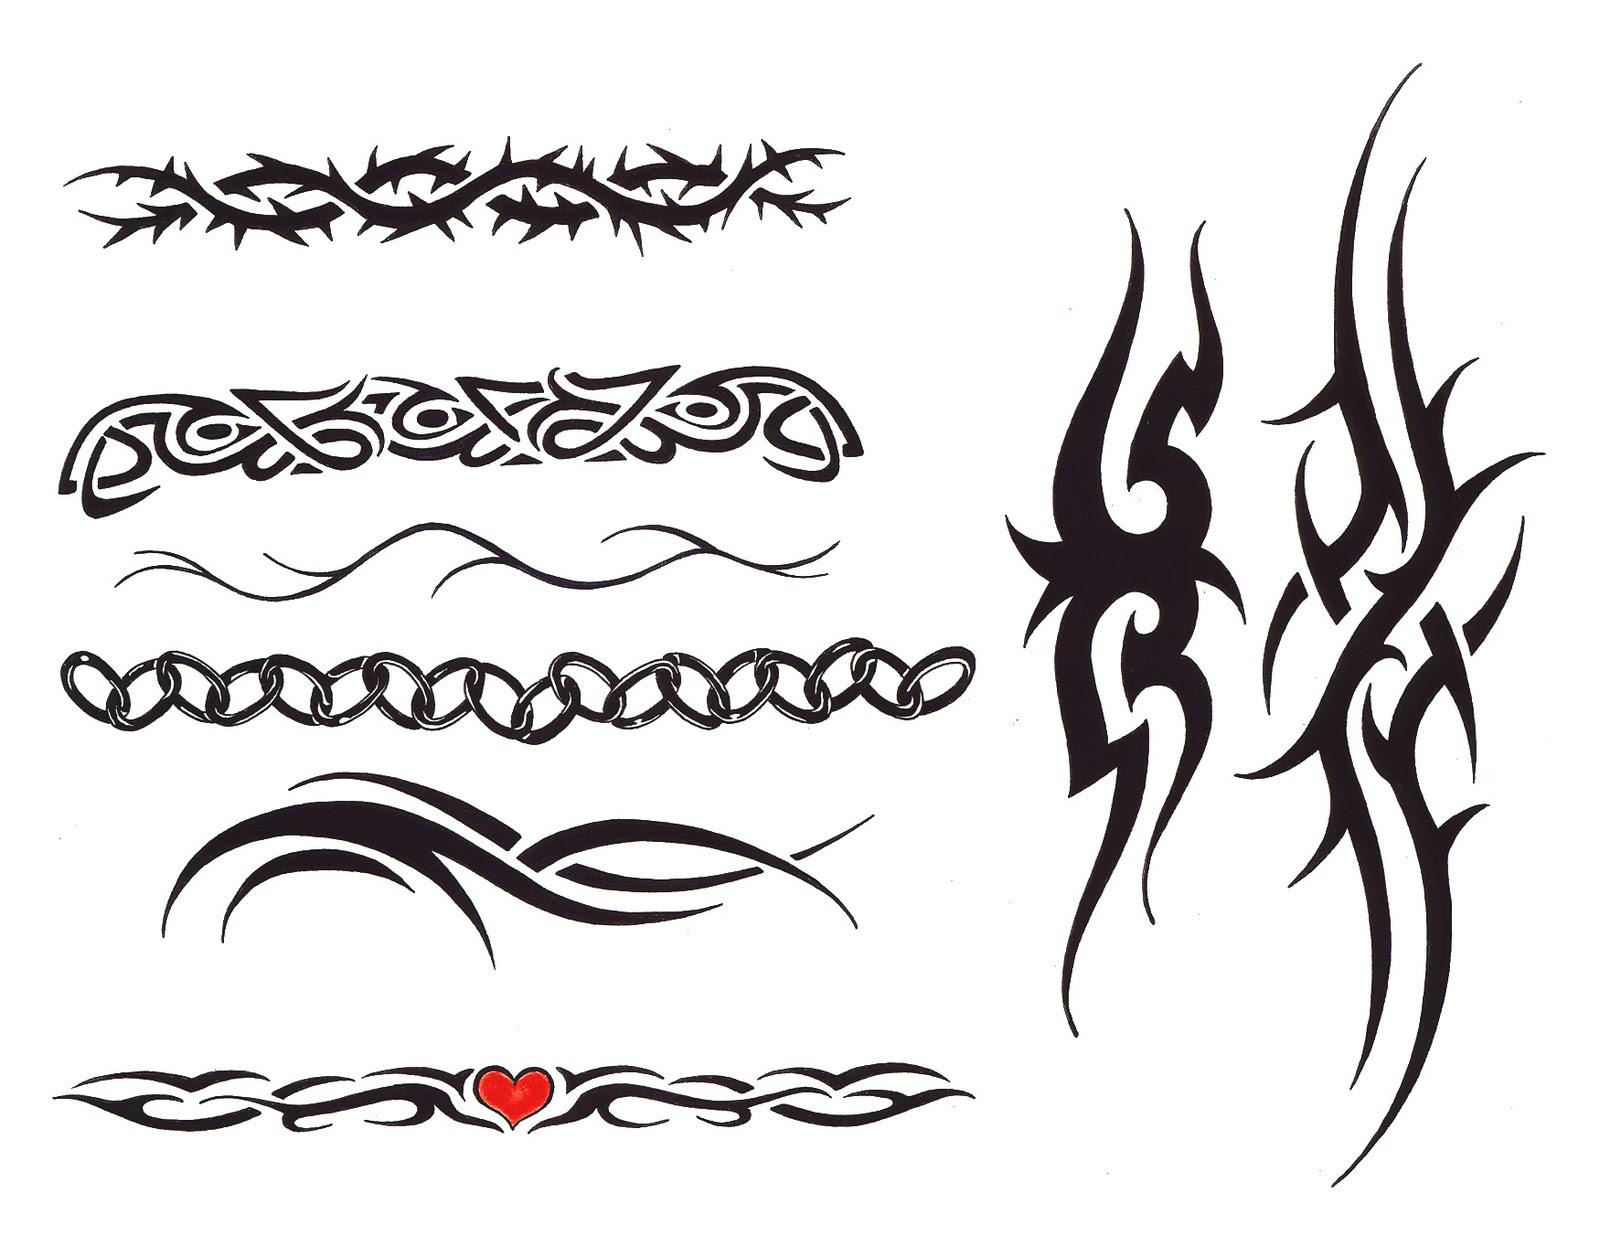 Tribal armband tattoos designs